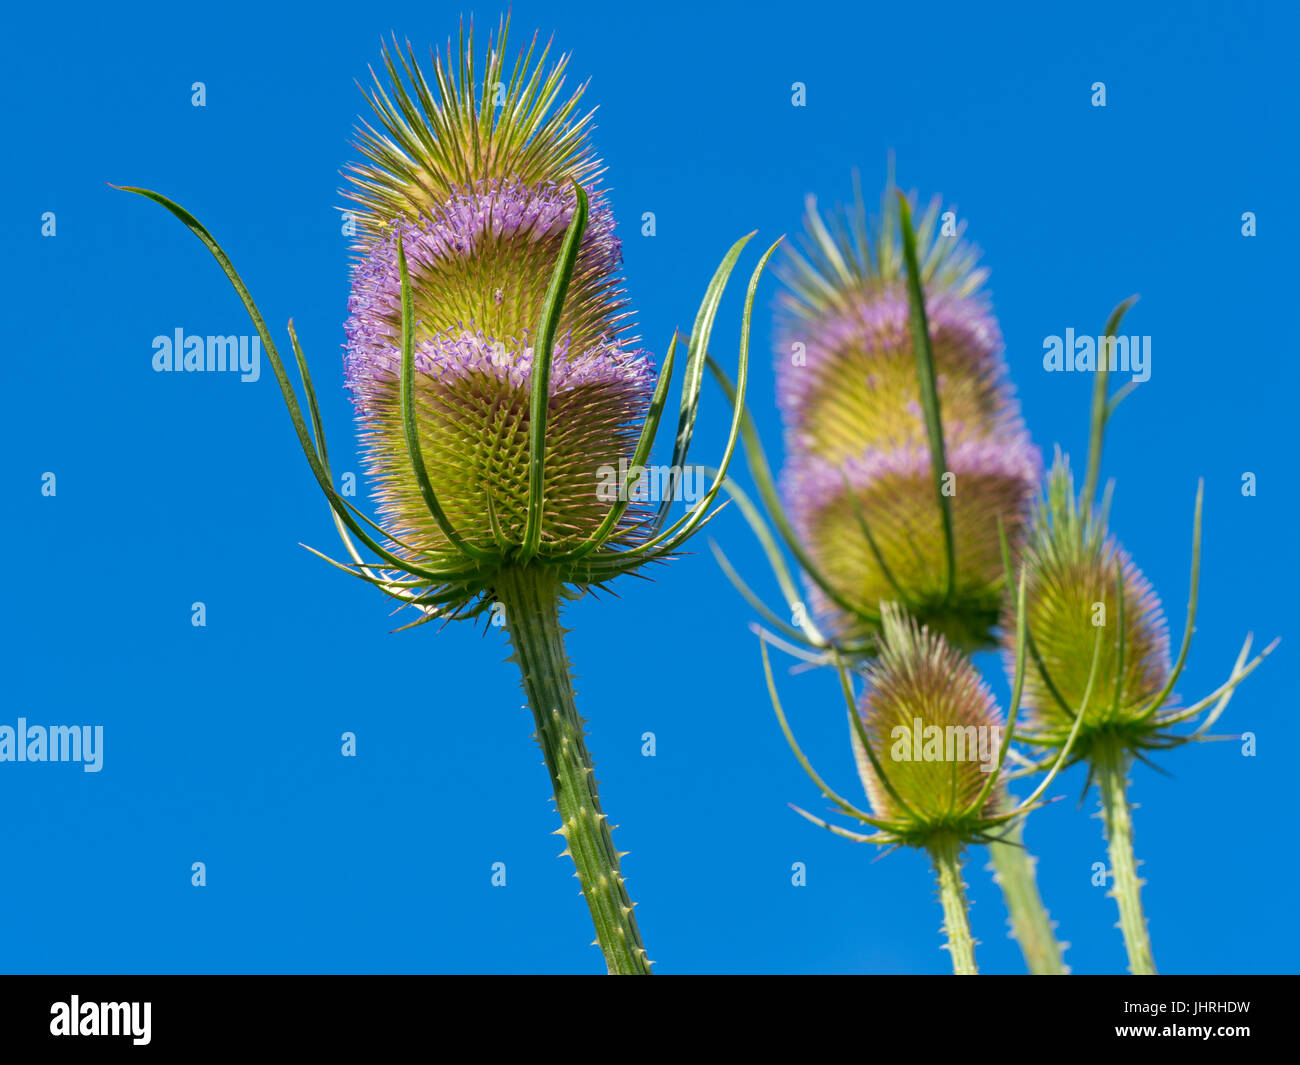 Teasal Dipsacus fullonum in flower against a blue sky - Stock Image